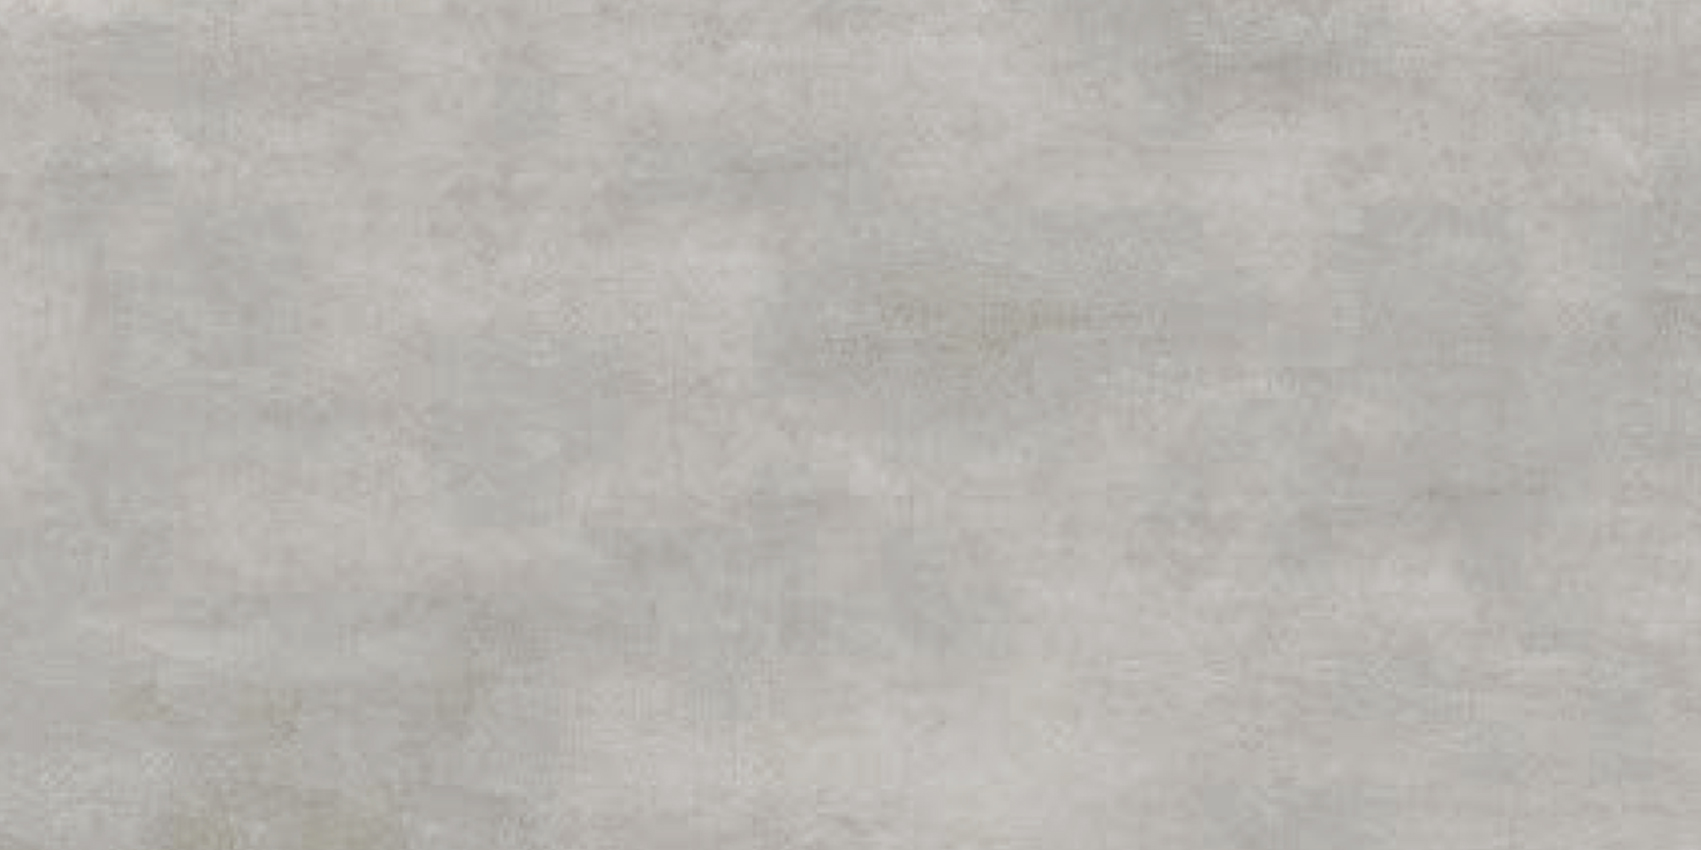 Sehati Cemento Grey SSP2373